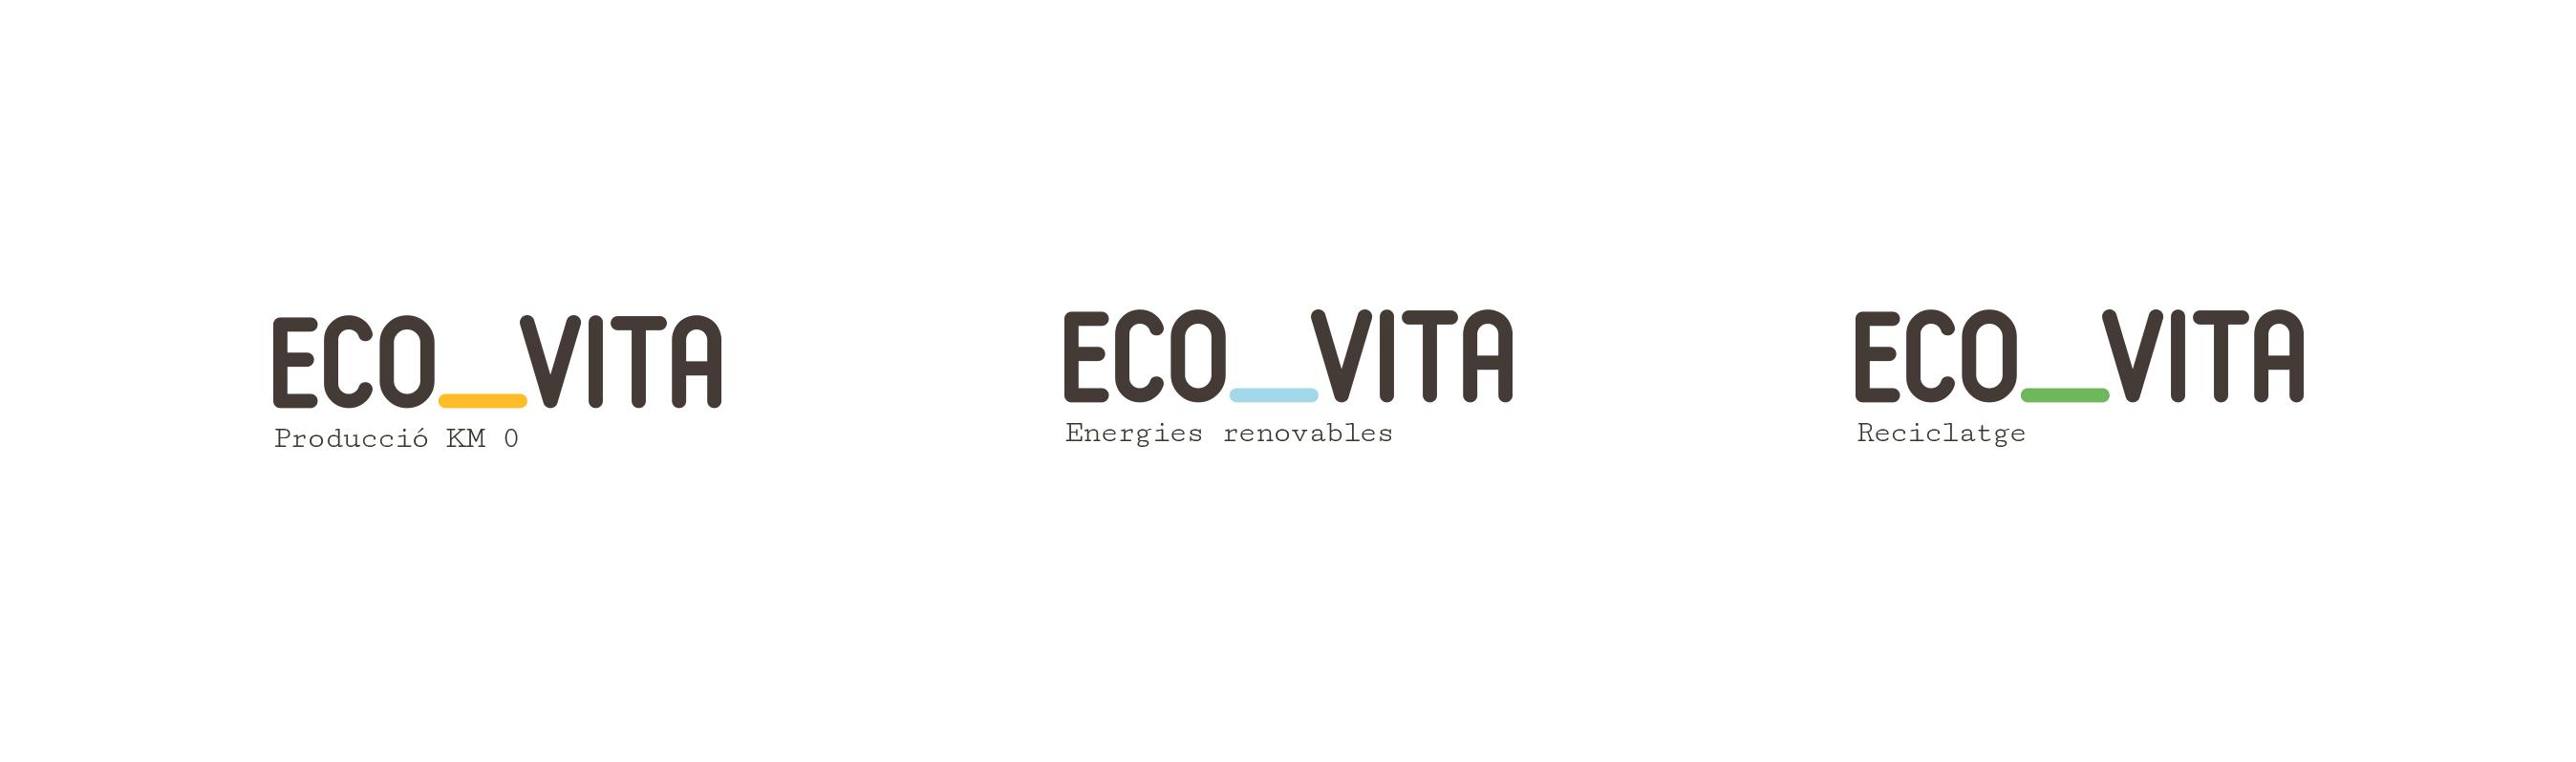 Logotips família ECO_VITA